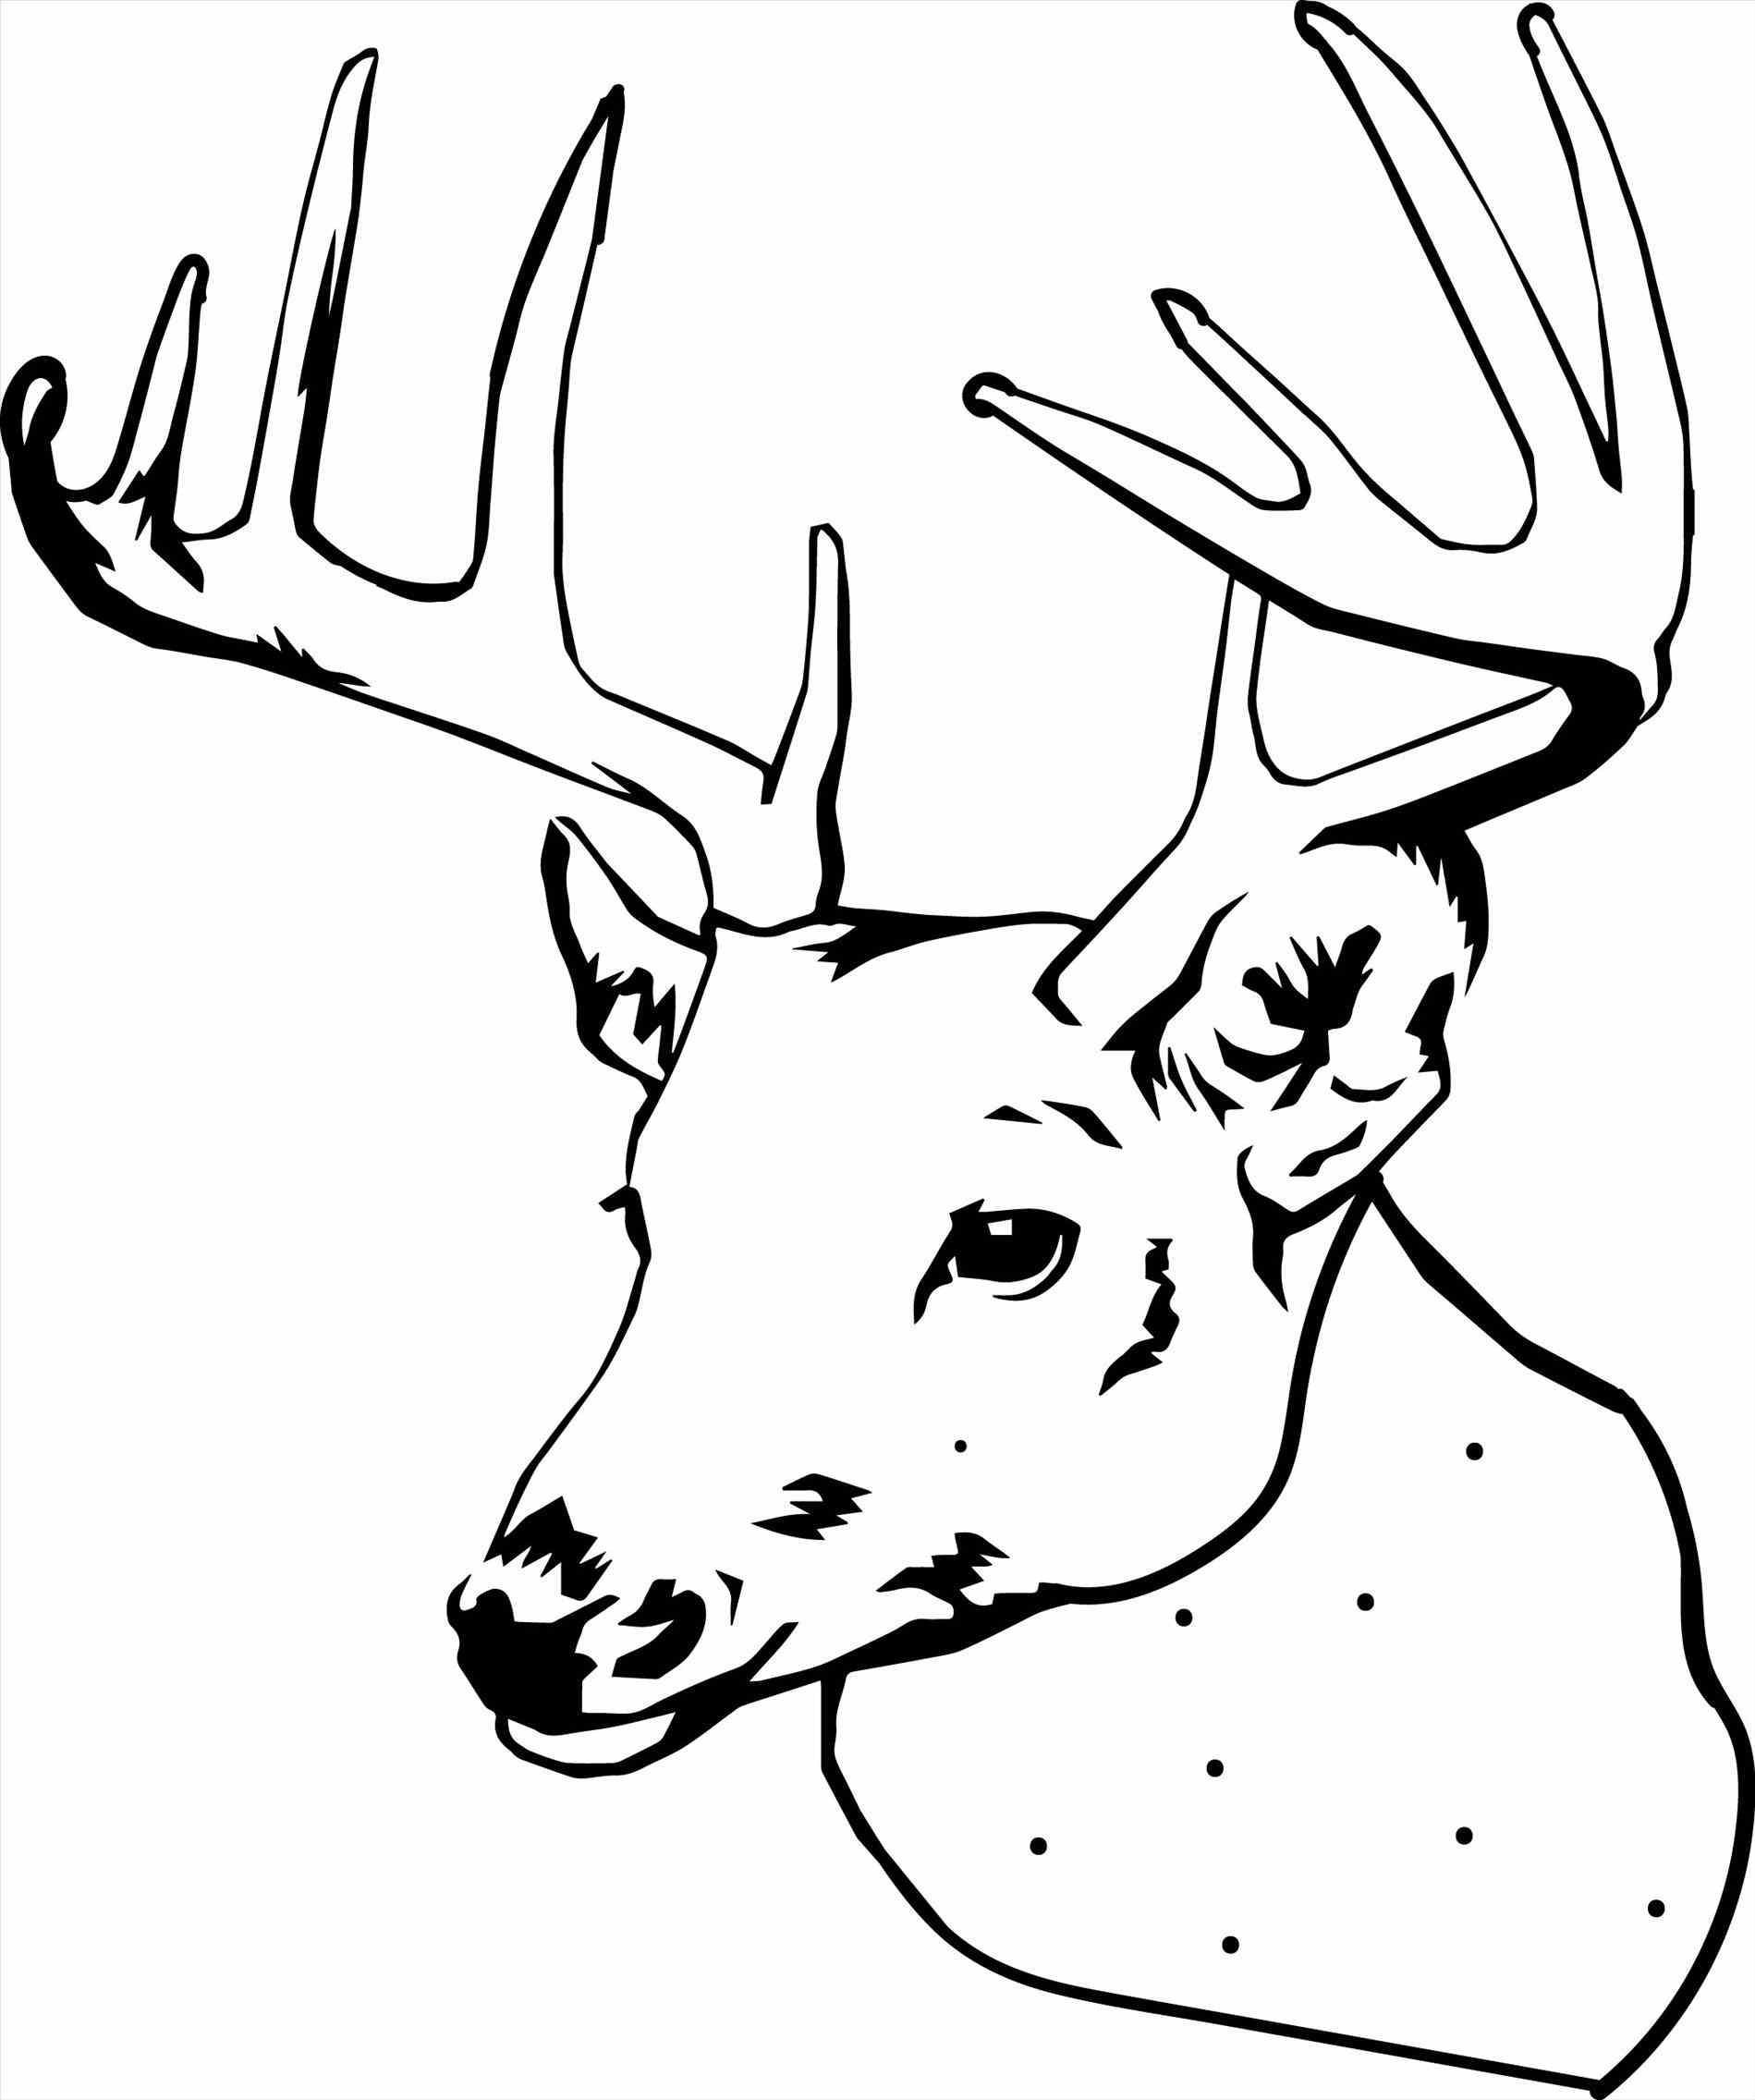 Deer Head Coloring Pages  Deer Coloring Page Image Clipart grig3